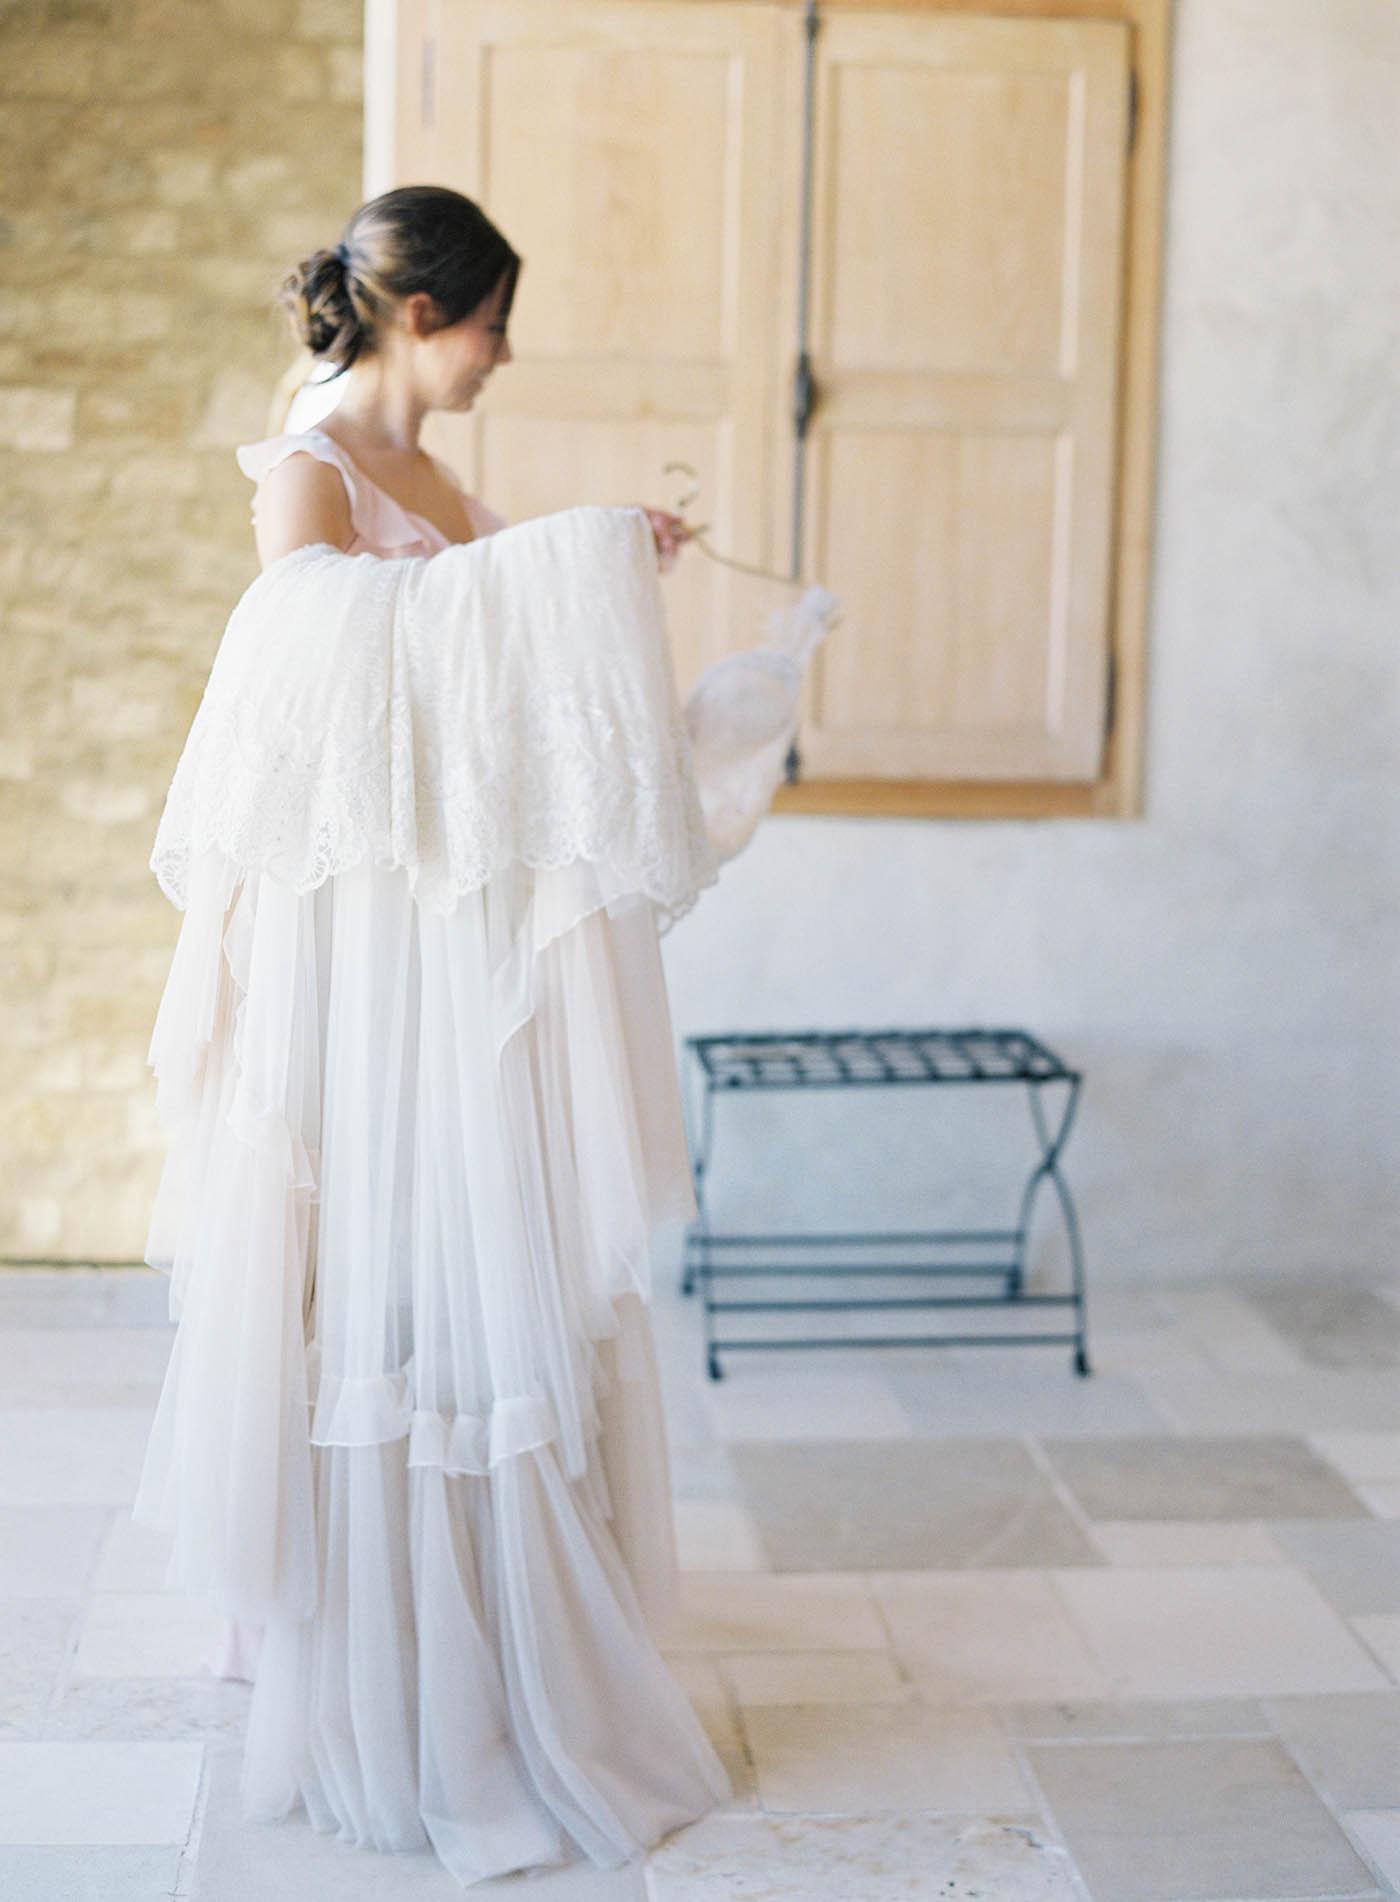 Sunstone-Villa-Wedding-4.jpg